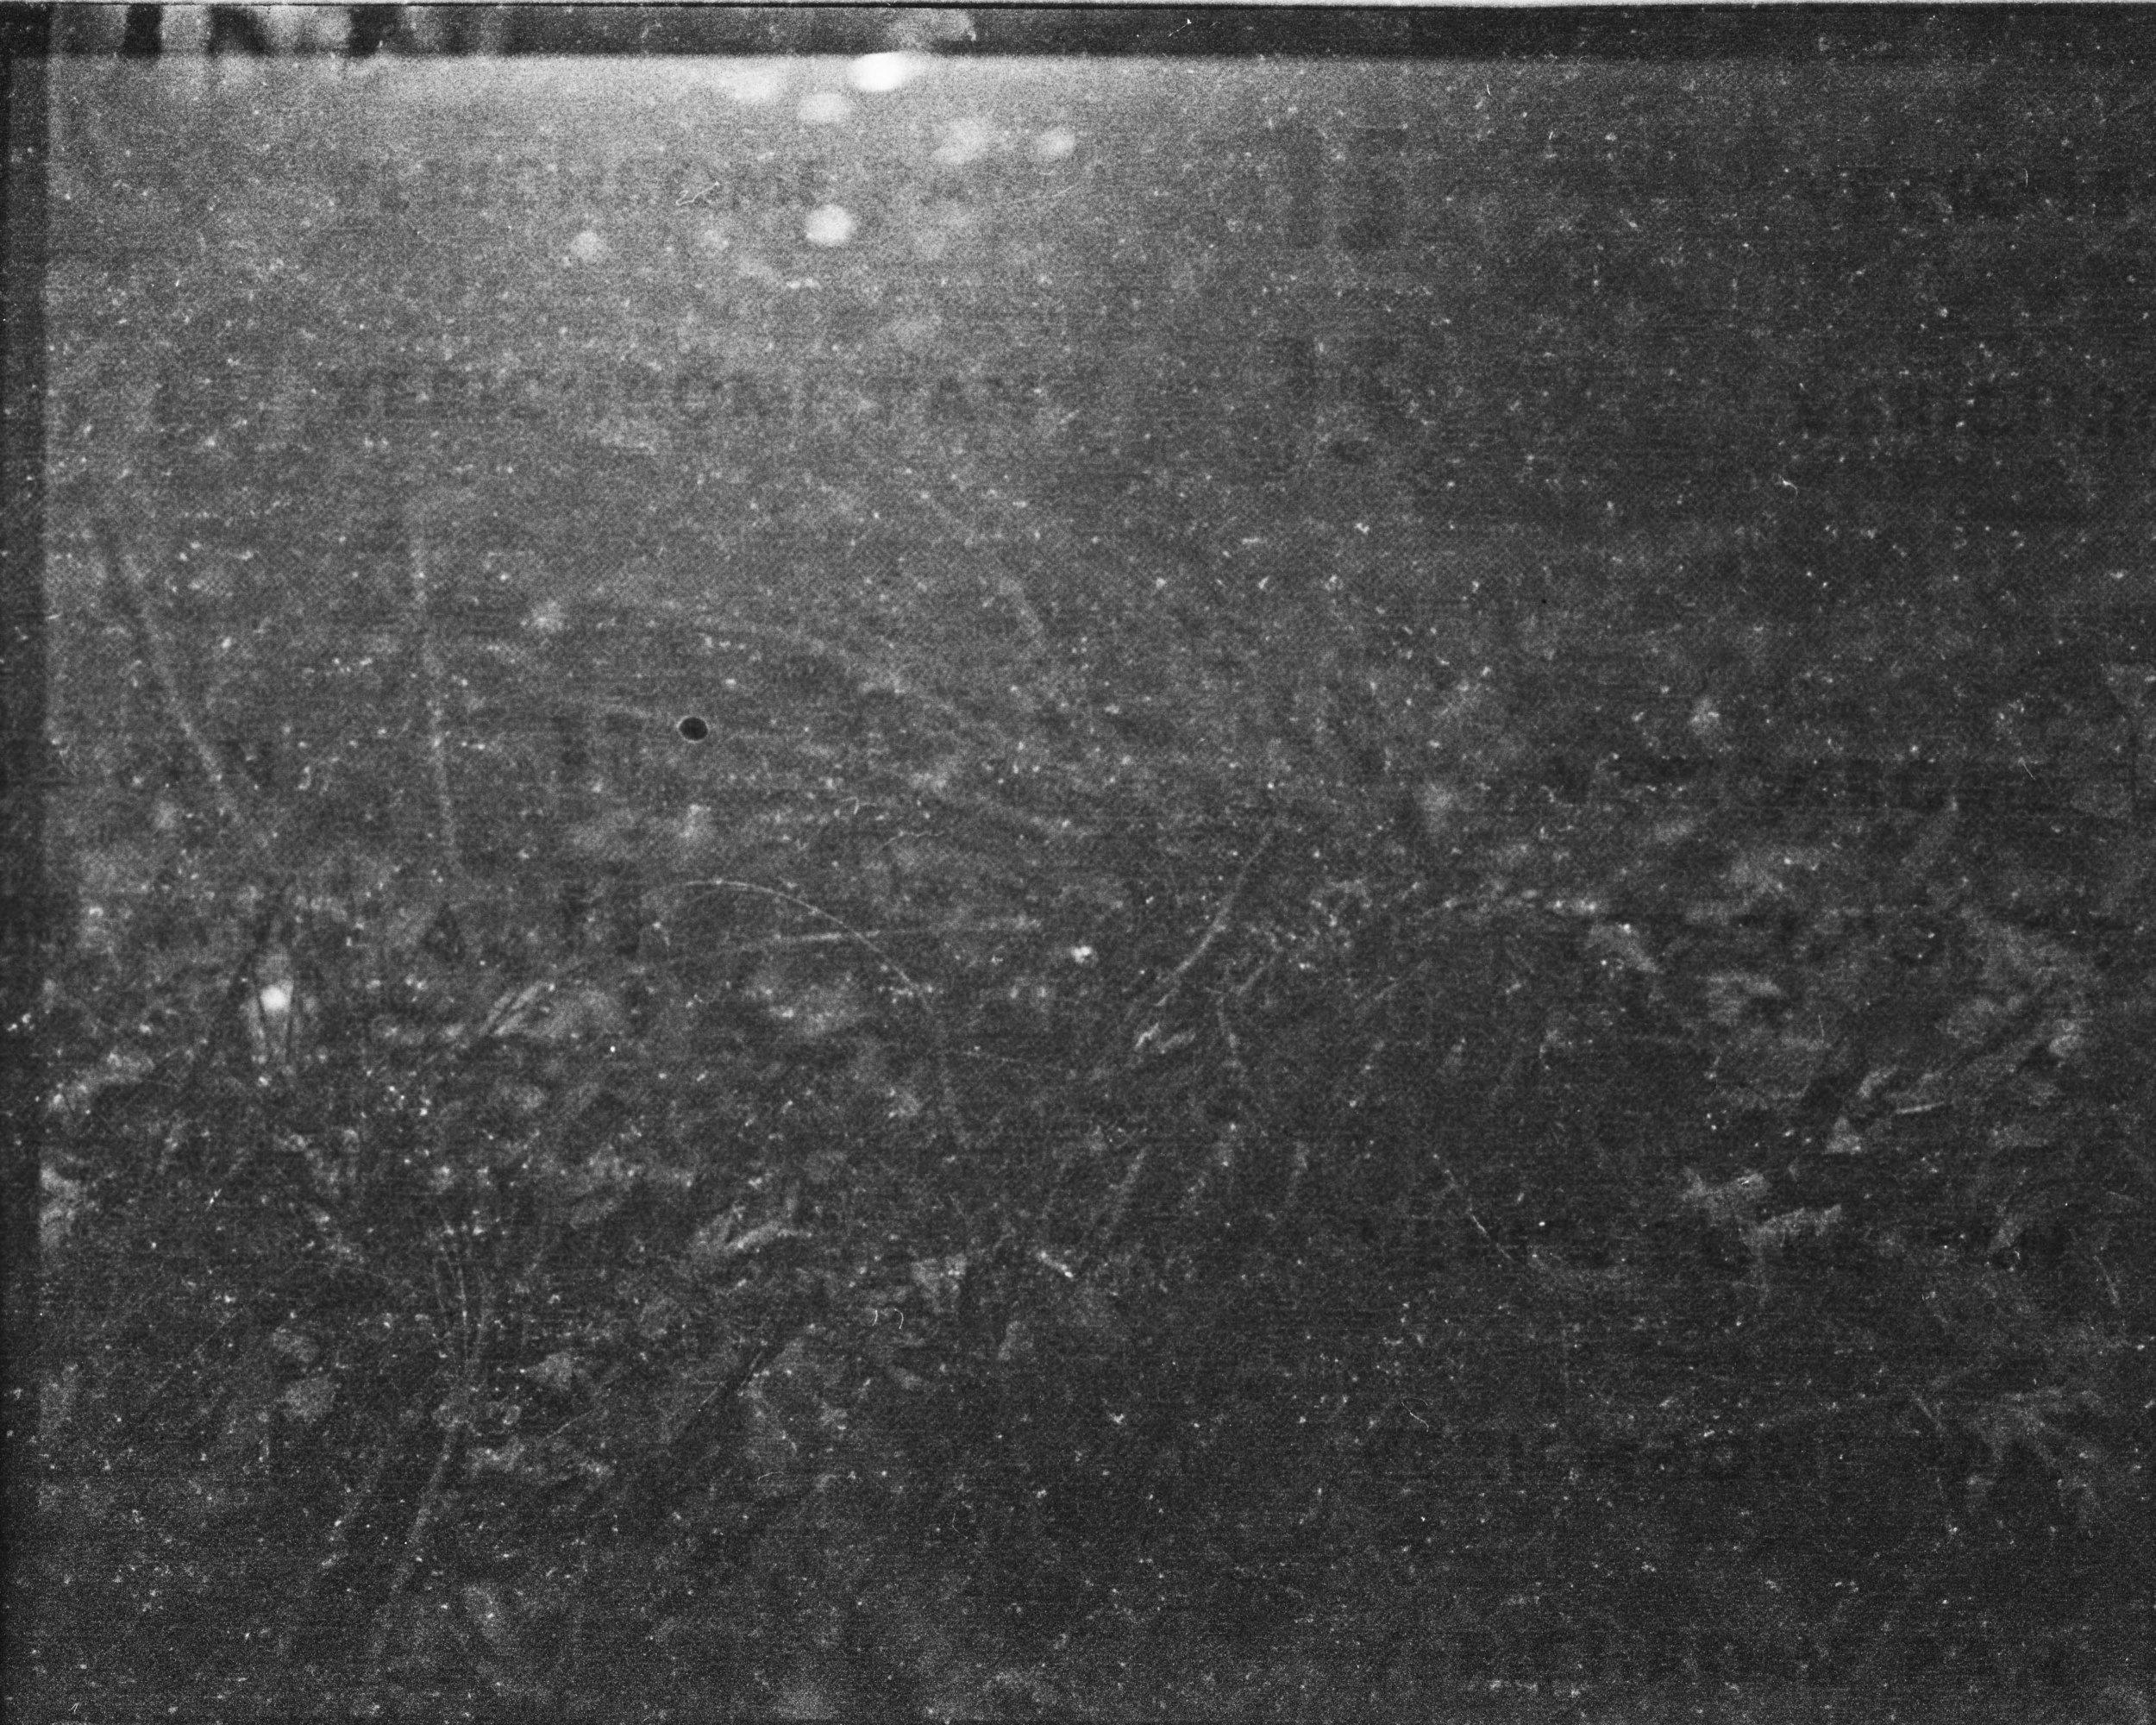 lydiasee-creekoffspringdale2014-color120mm-batch139.JPG